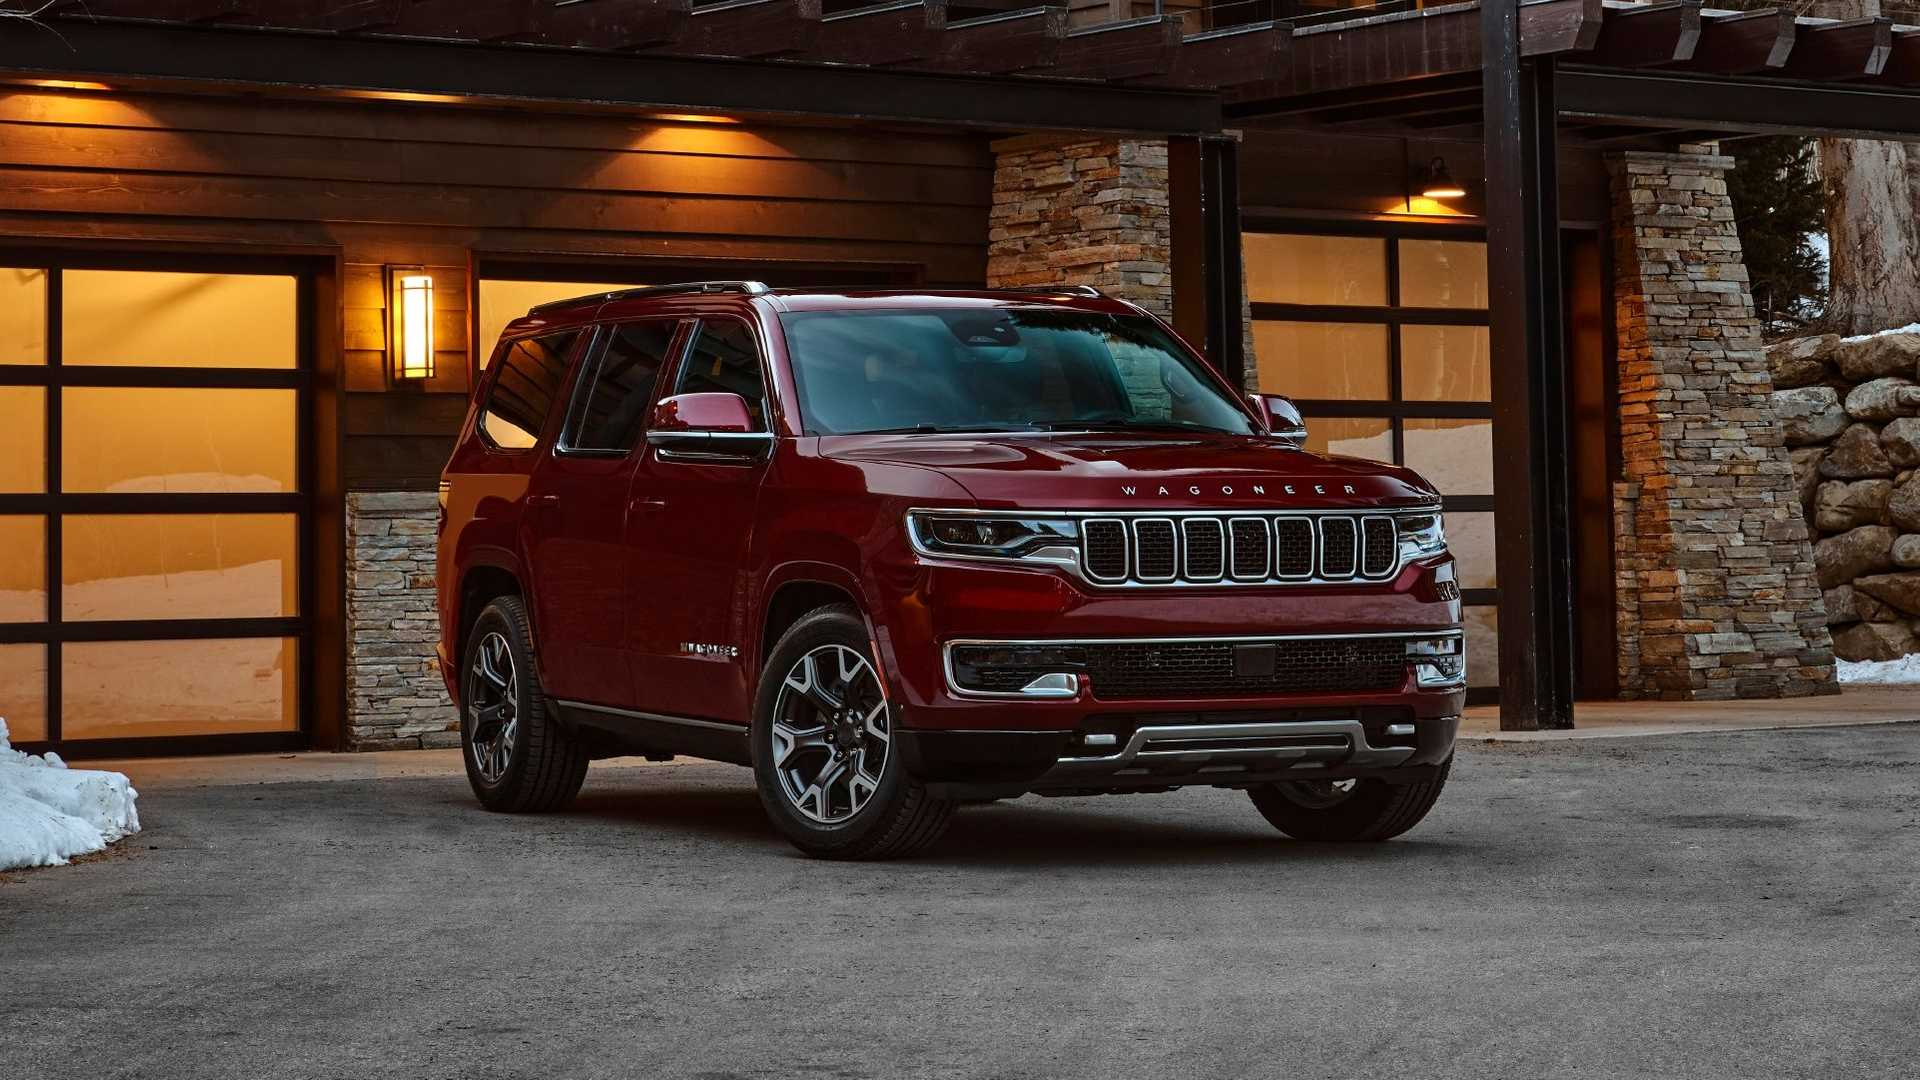 2022-jeep-wagoneer-exterior-front-quarter-1